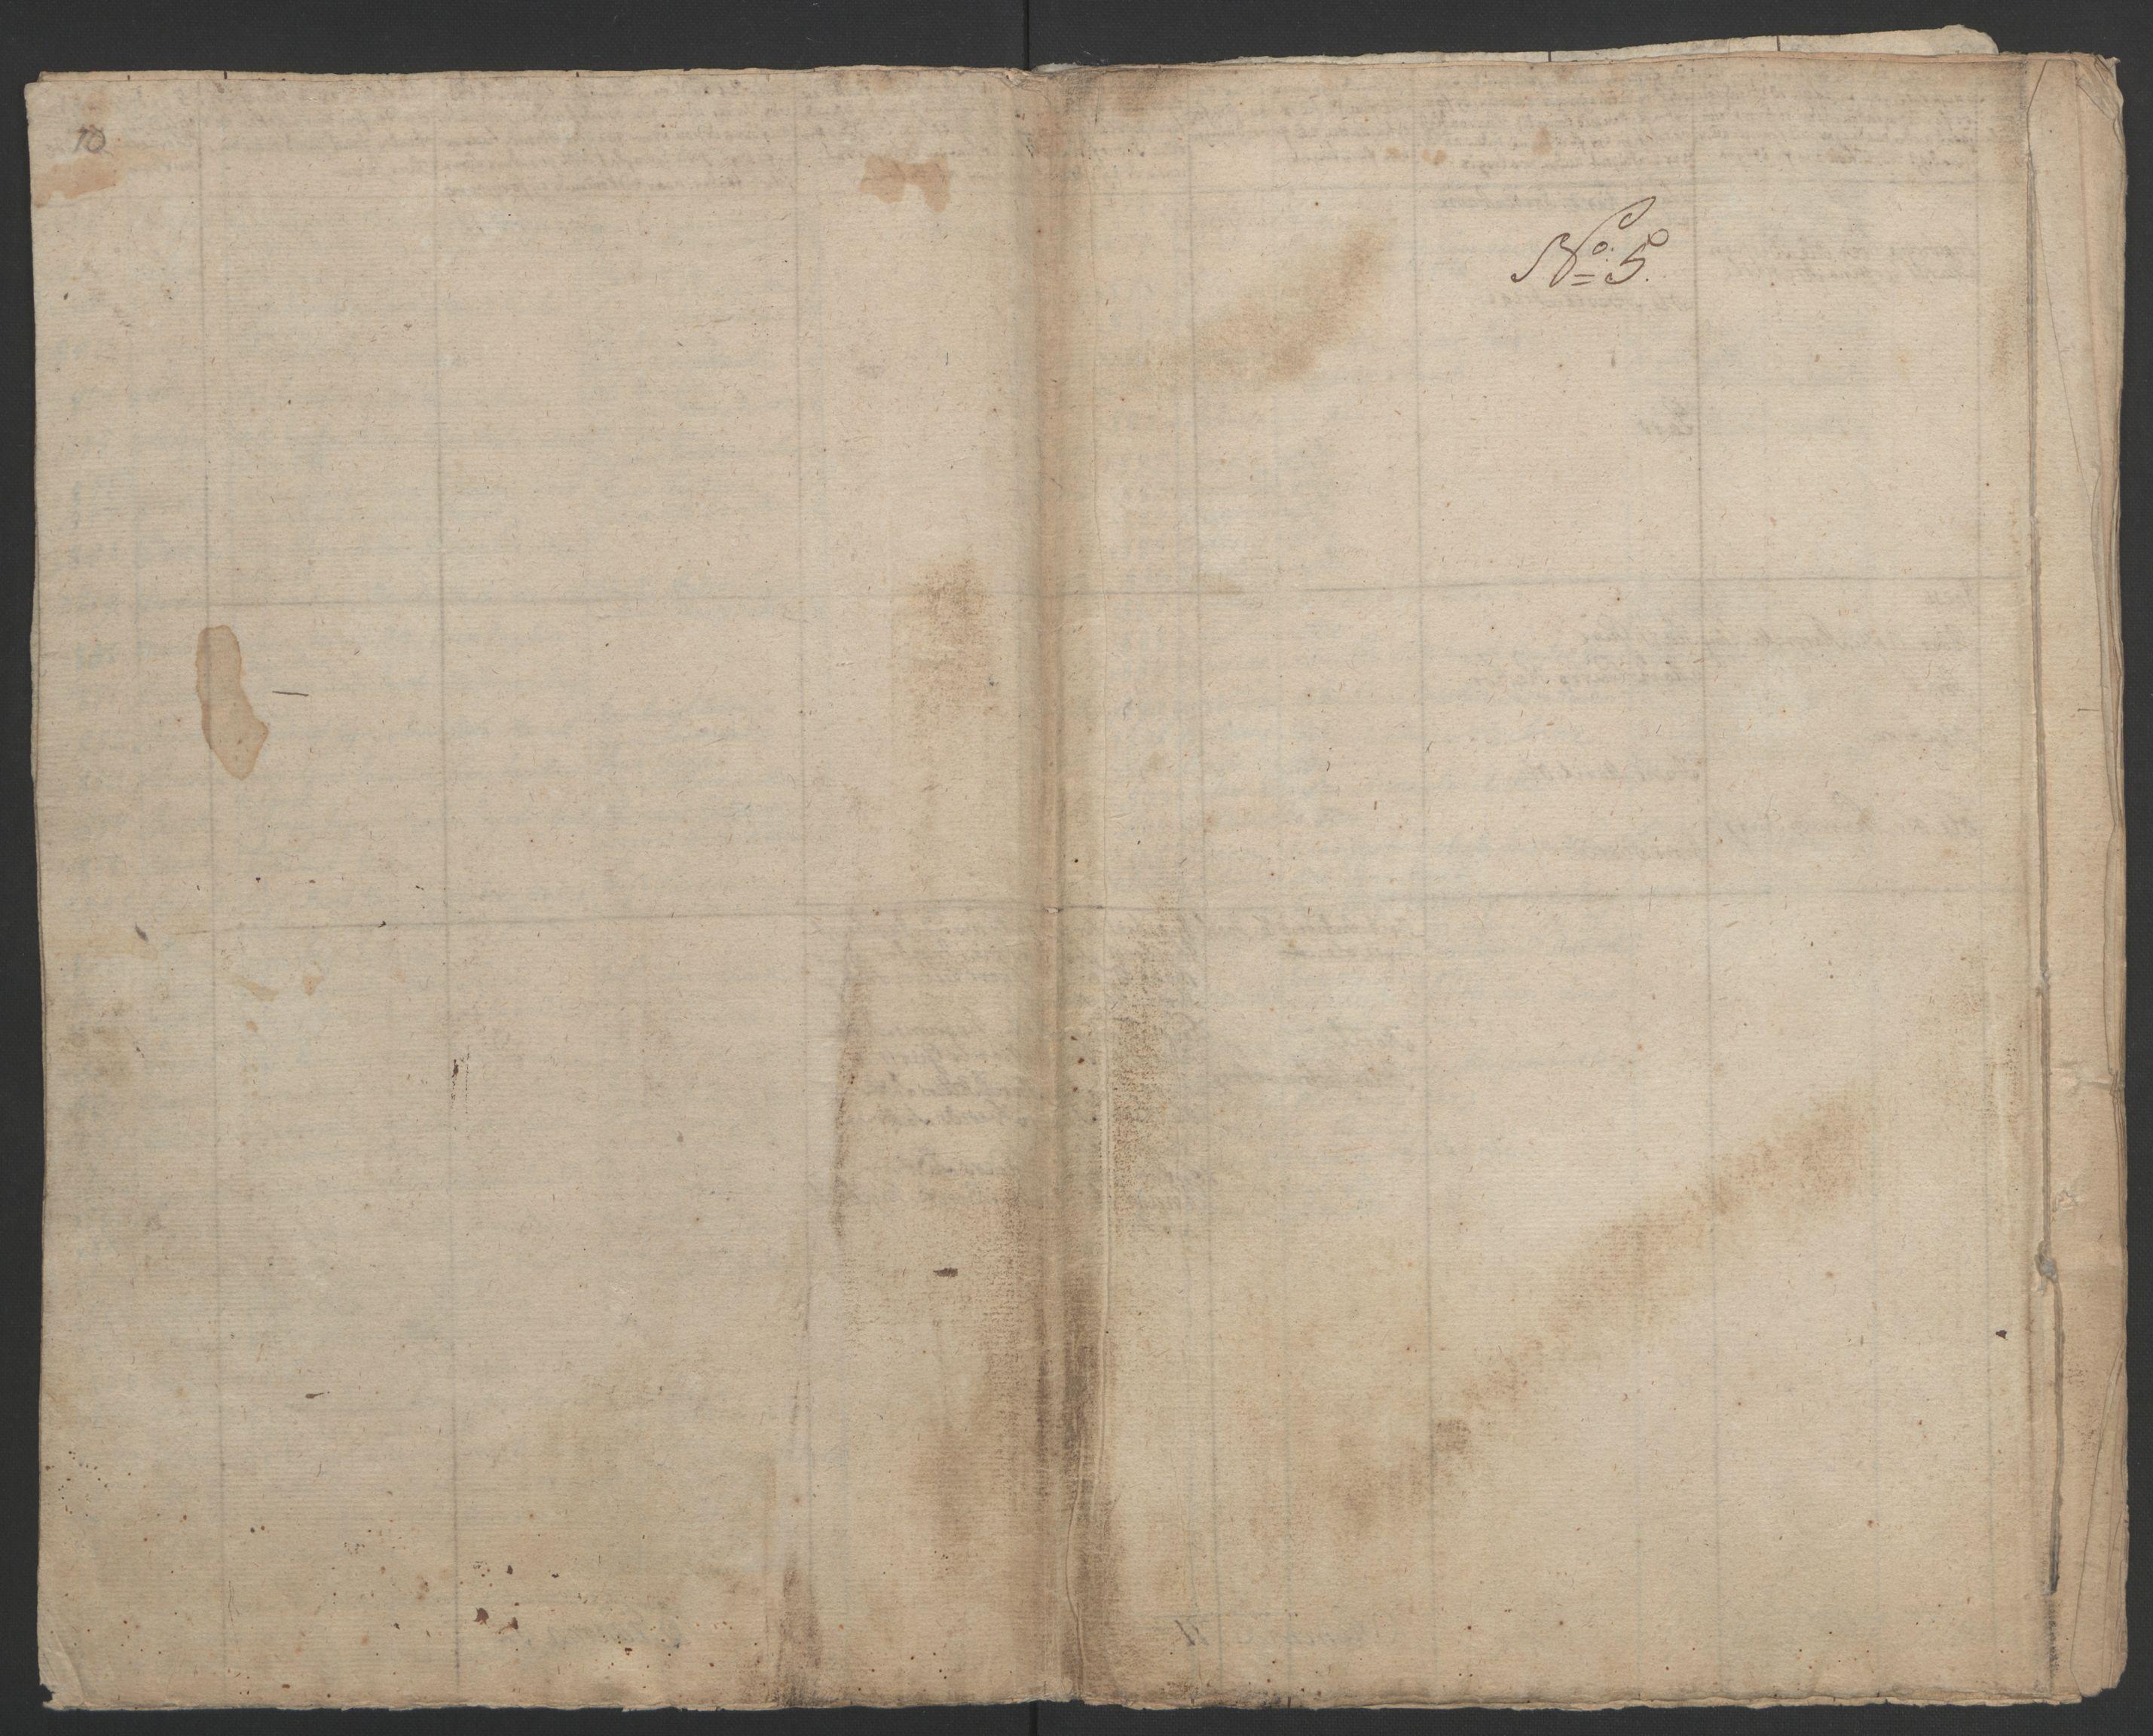 RA, Rentekammeret inntil 1814, Realistisk ordnet avdeling, Ol/L0021: [Gg 10]: Ekstraskatten, 23.09.1762. Orkdal og Gauldal, 1762-1767, s. 714